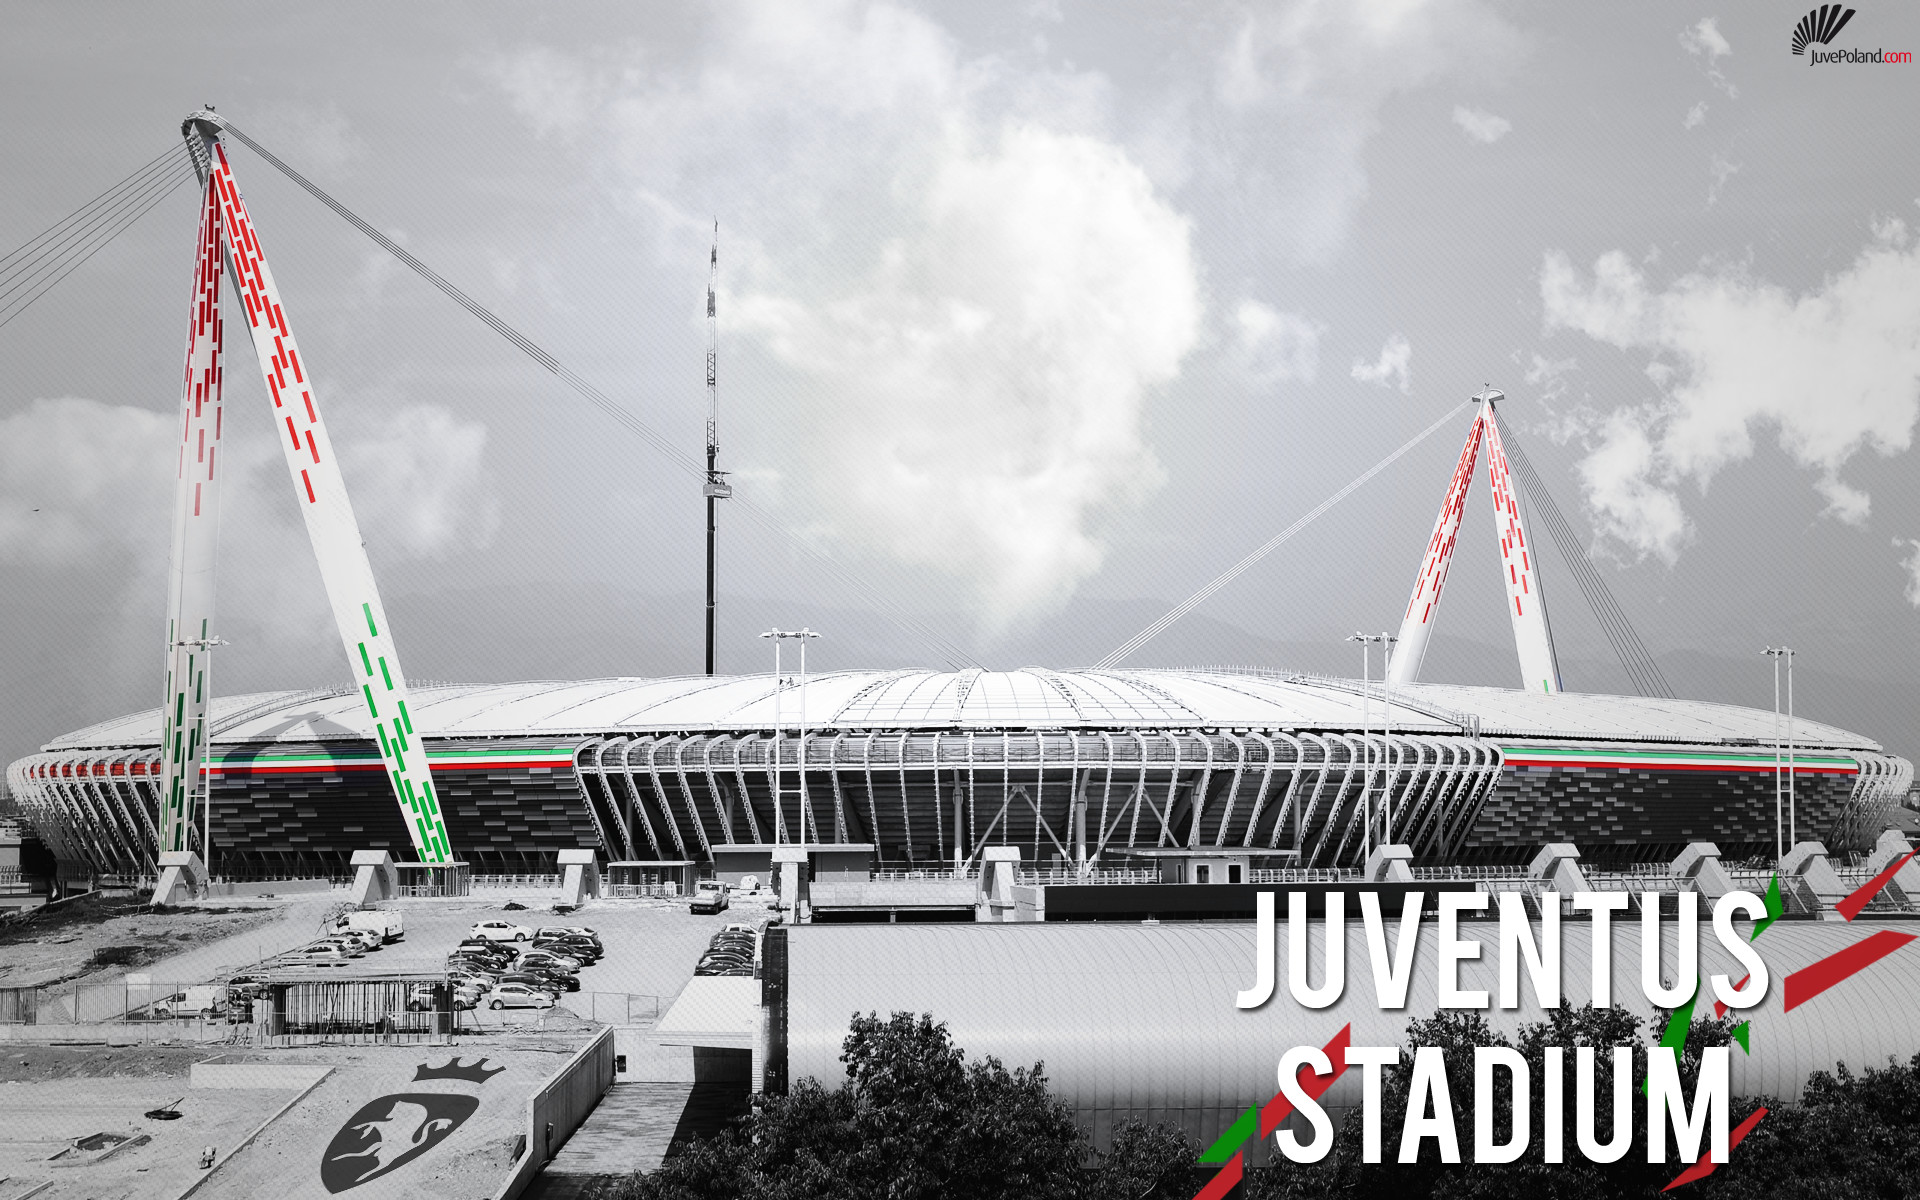 Sfondi Juventus 2017 71 Immagini